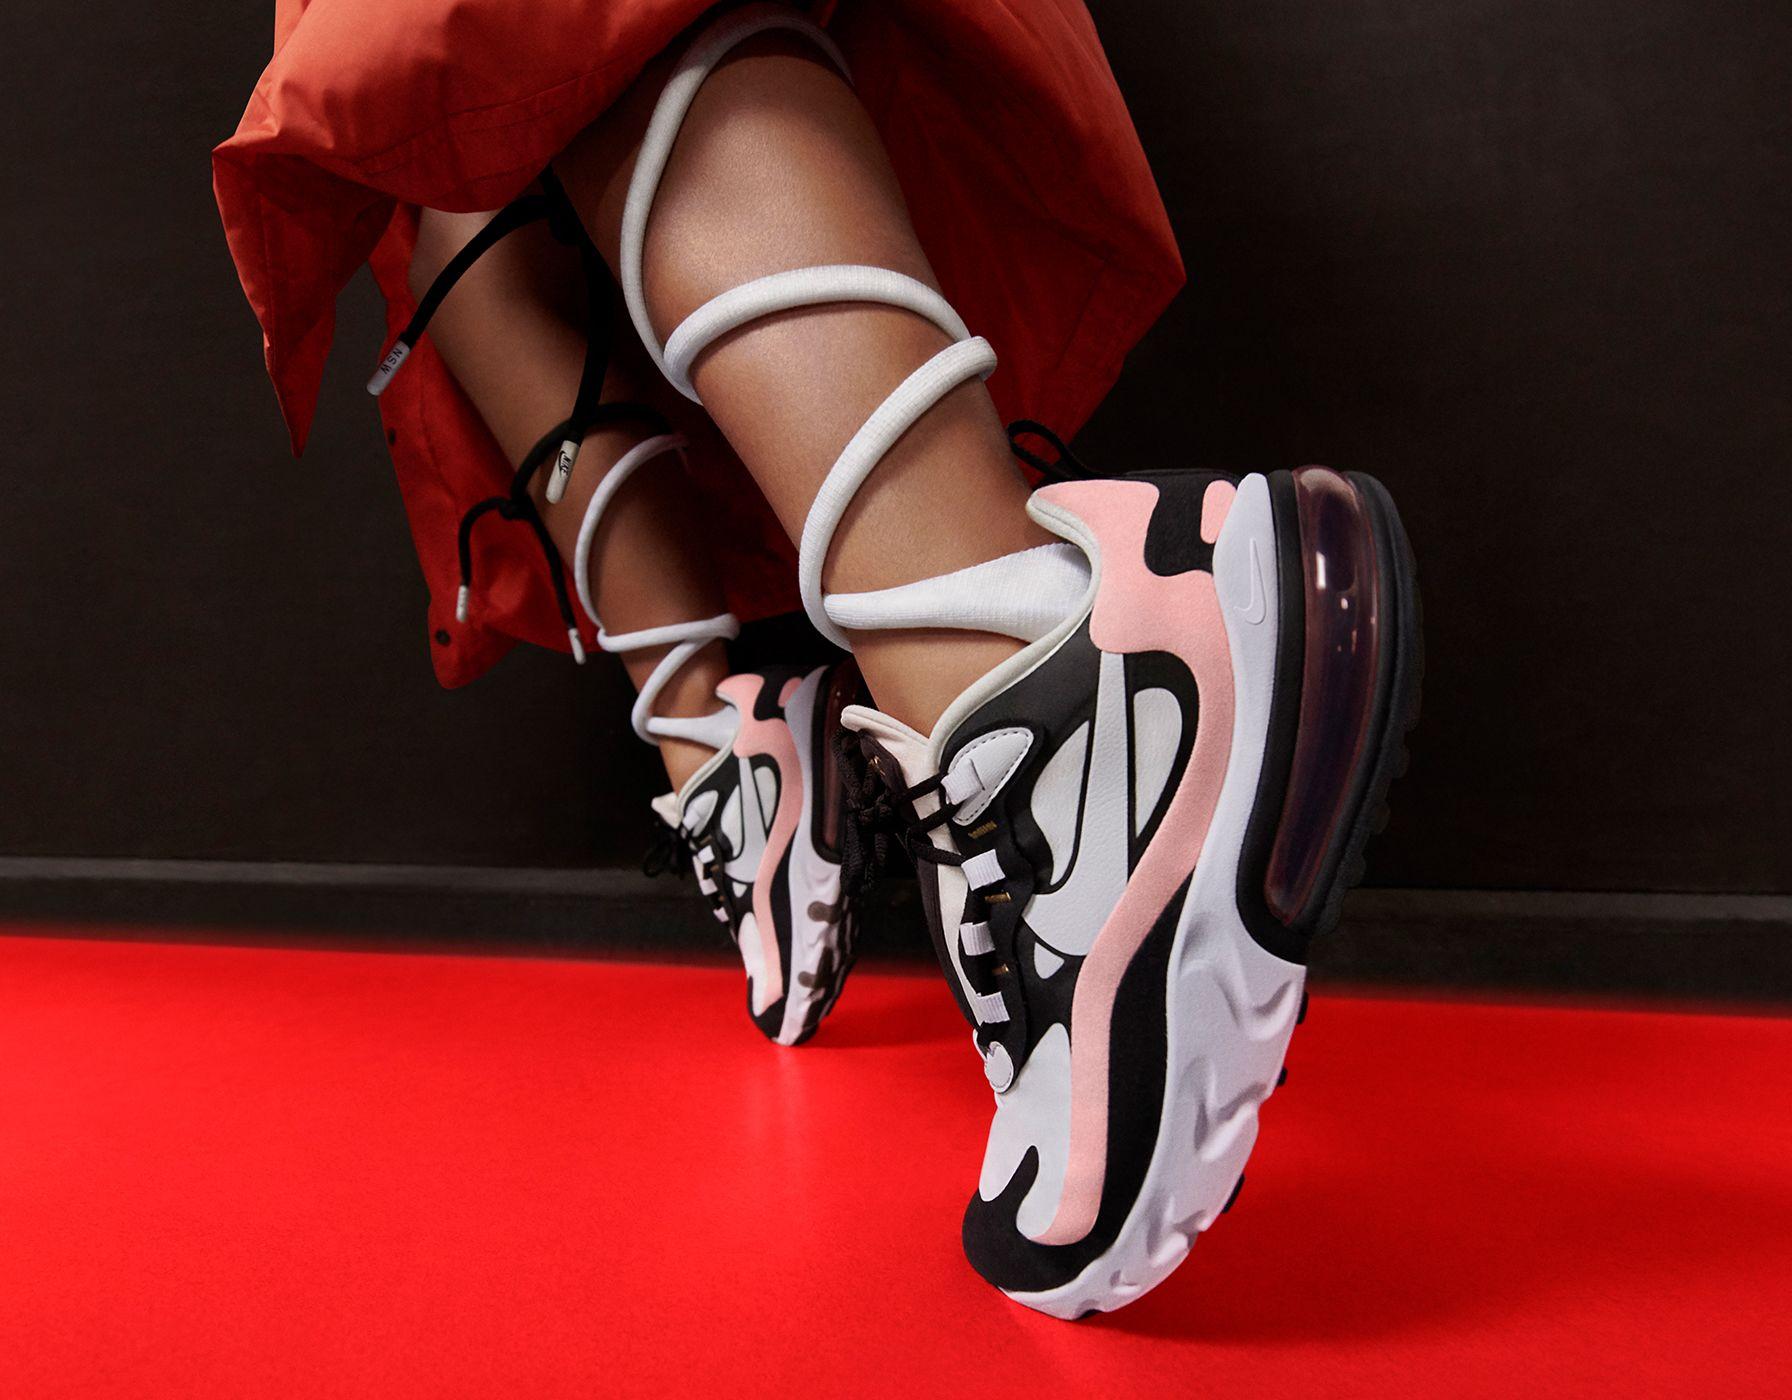 Hermoso En Color, Online Nike Air Max Plus Soccer Zapatos